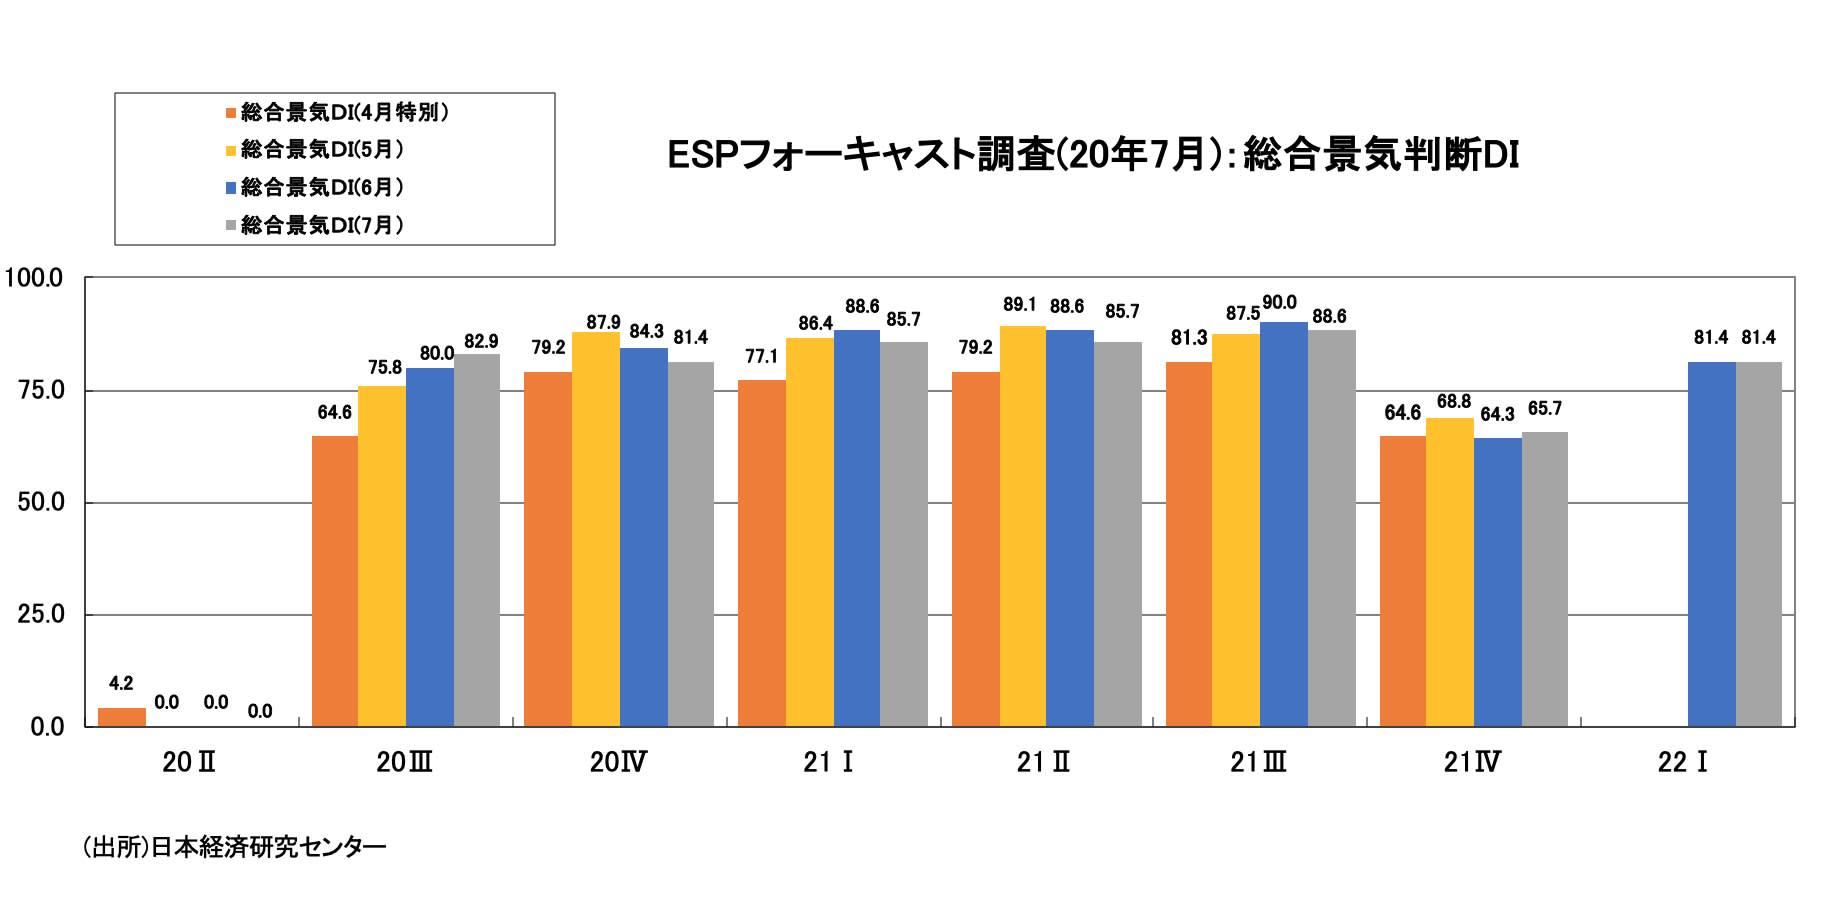 ESPフォーキャスト調査・総合景気判断DI